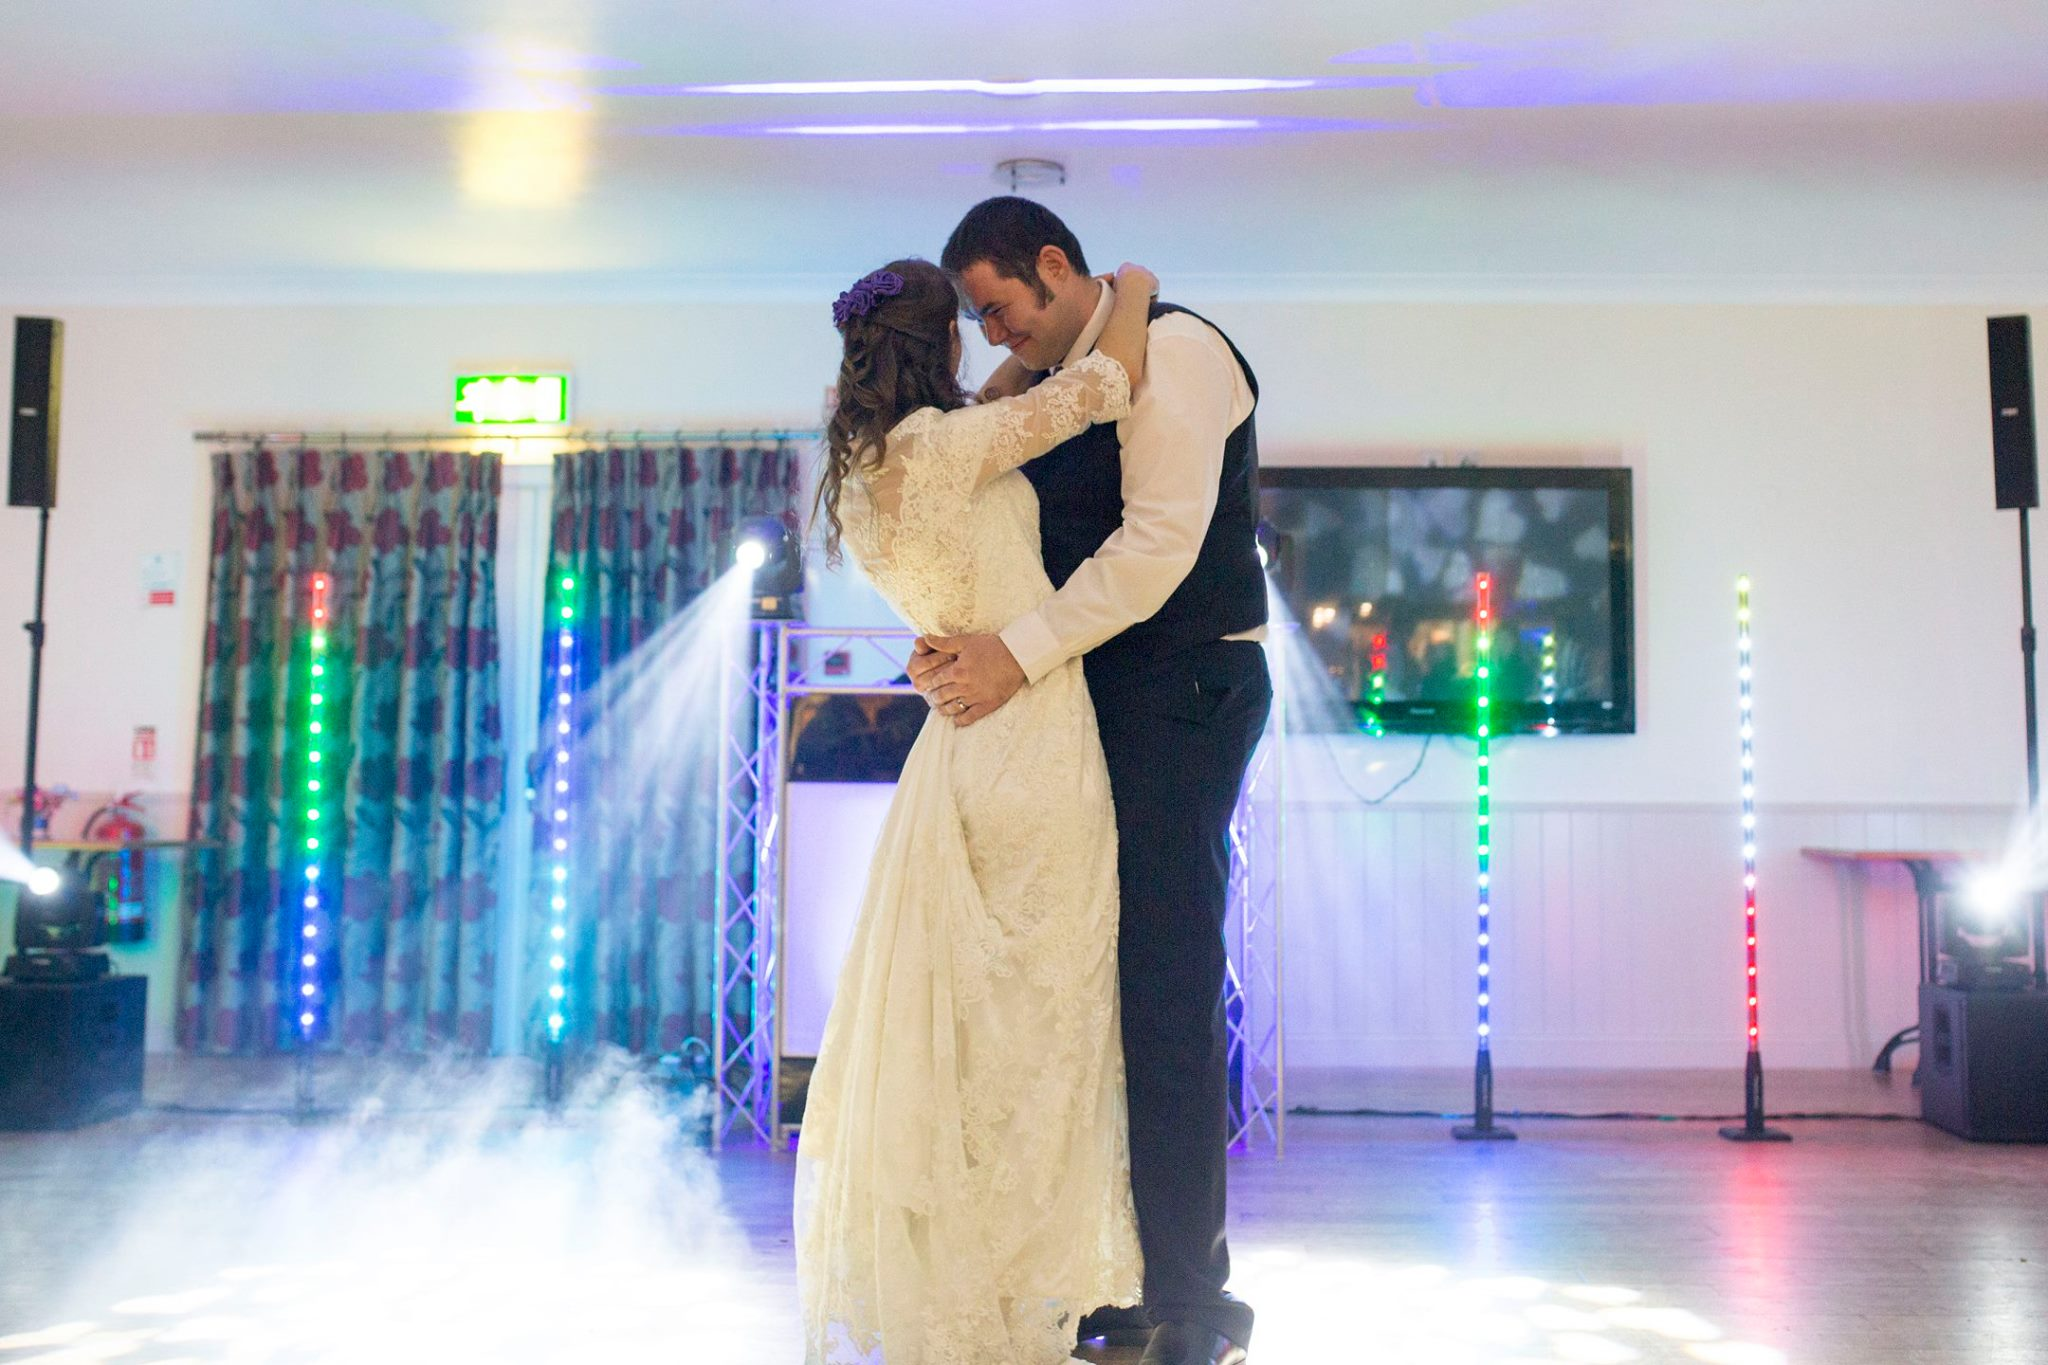 cornwall wedding disco dj photographer 48